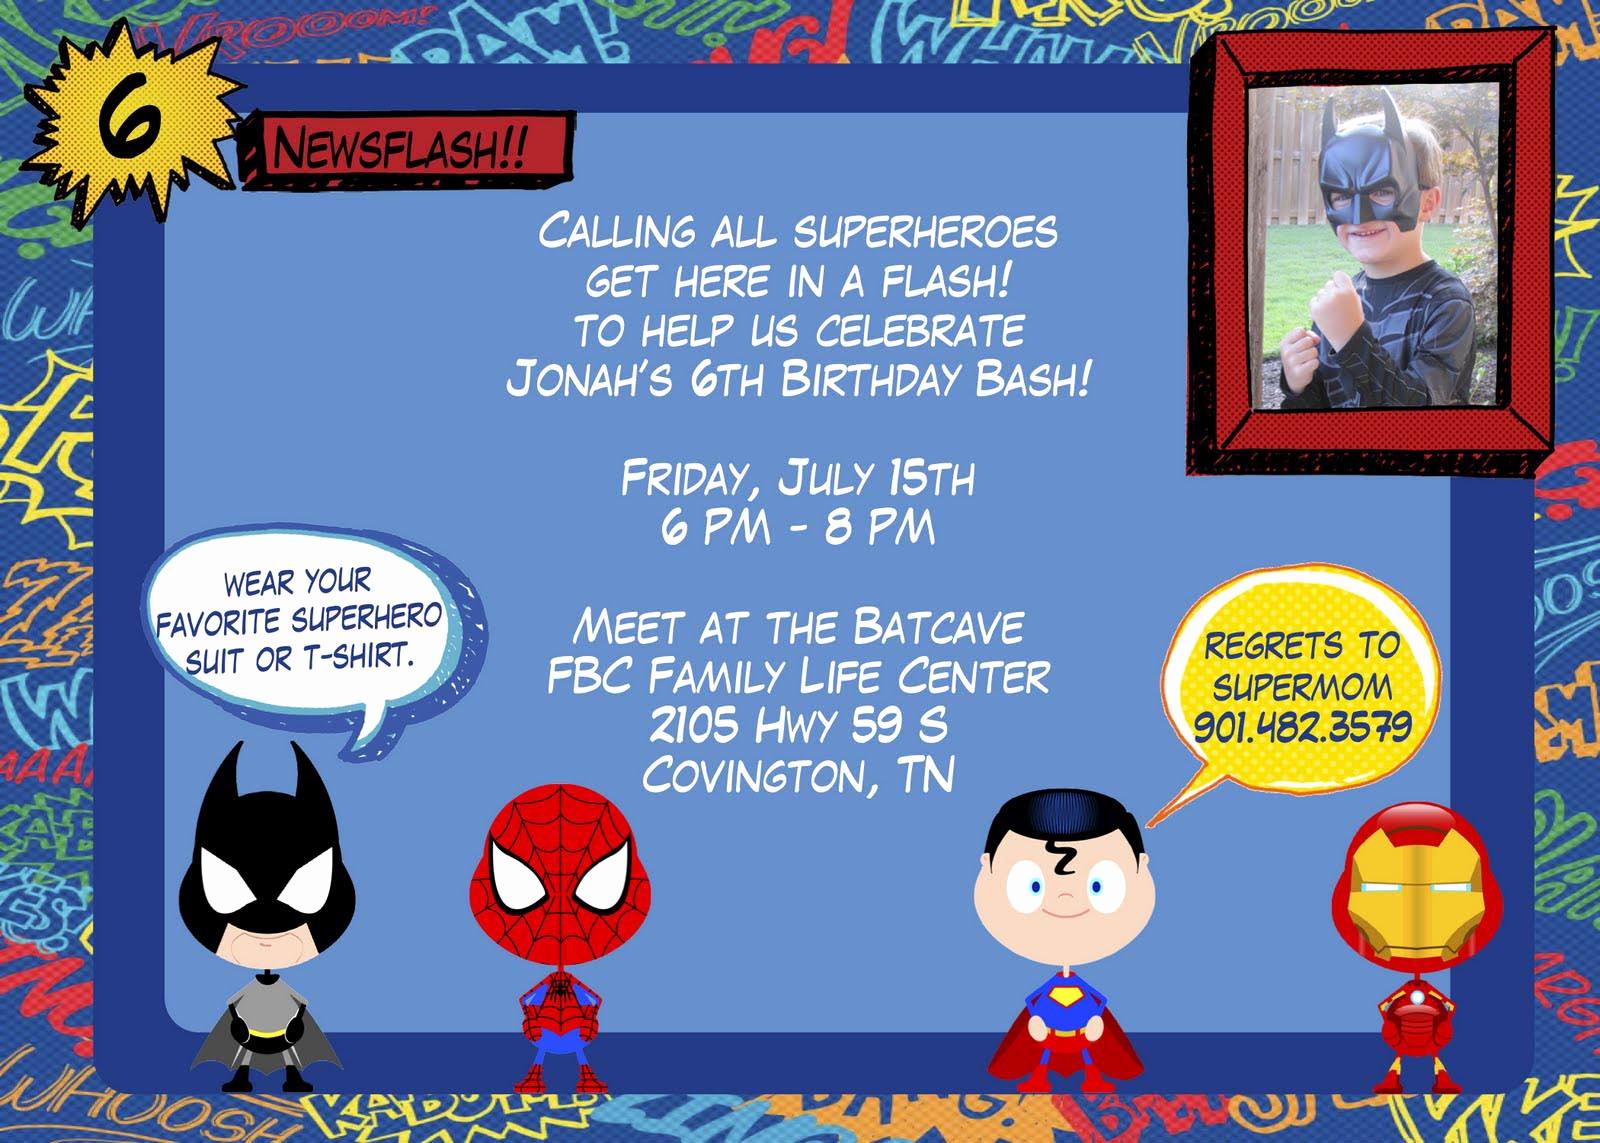 Superhero Invitation Template Download New How to Arrange A Superhero Birthday Party